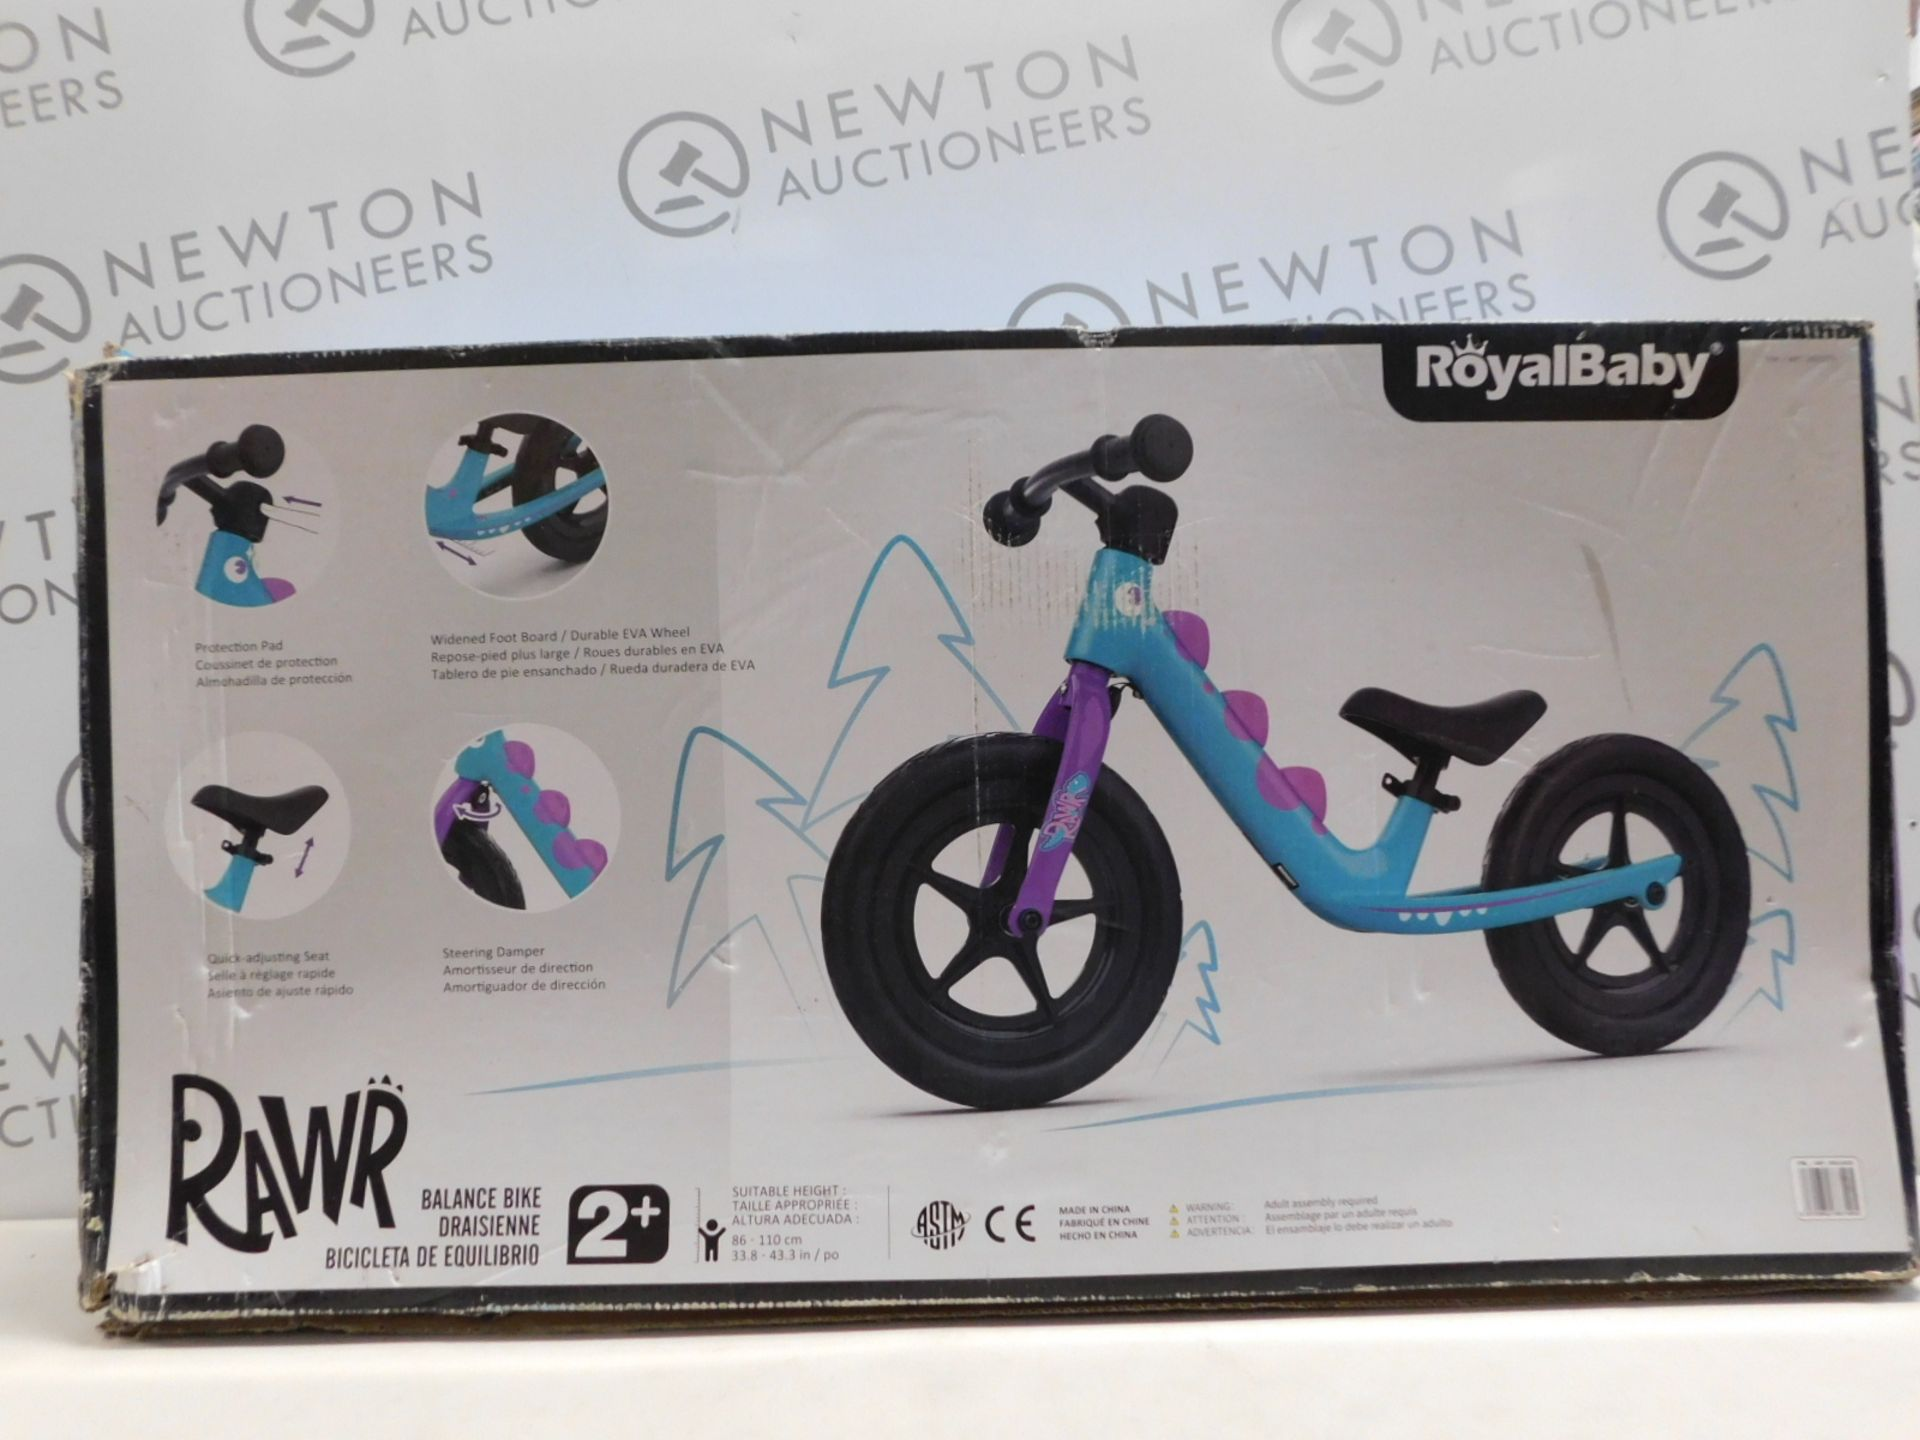 1 BOXED ROYALBABY BOYS BALANCE BIKE RAWR RRP £99